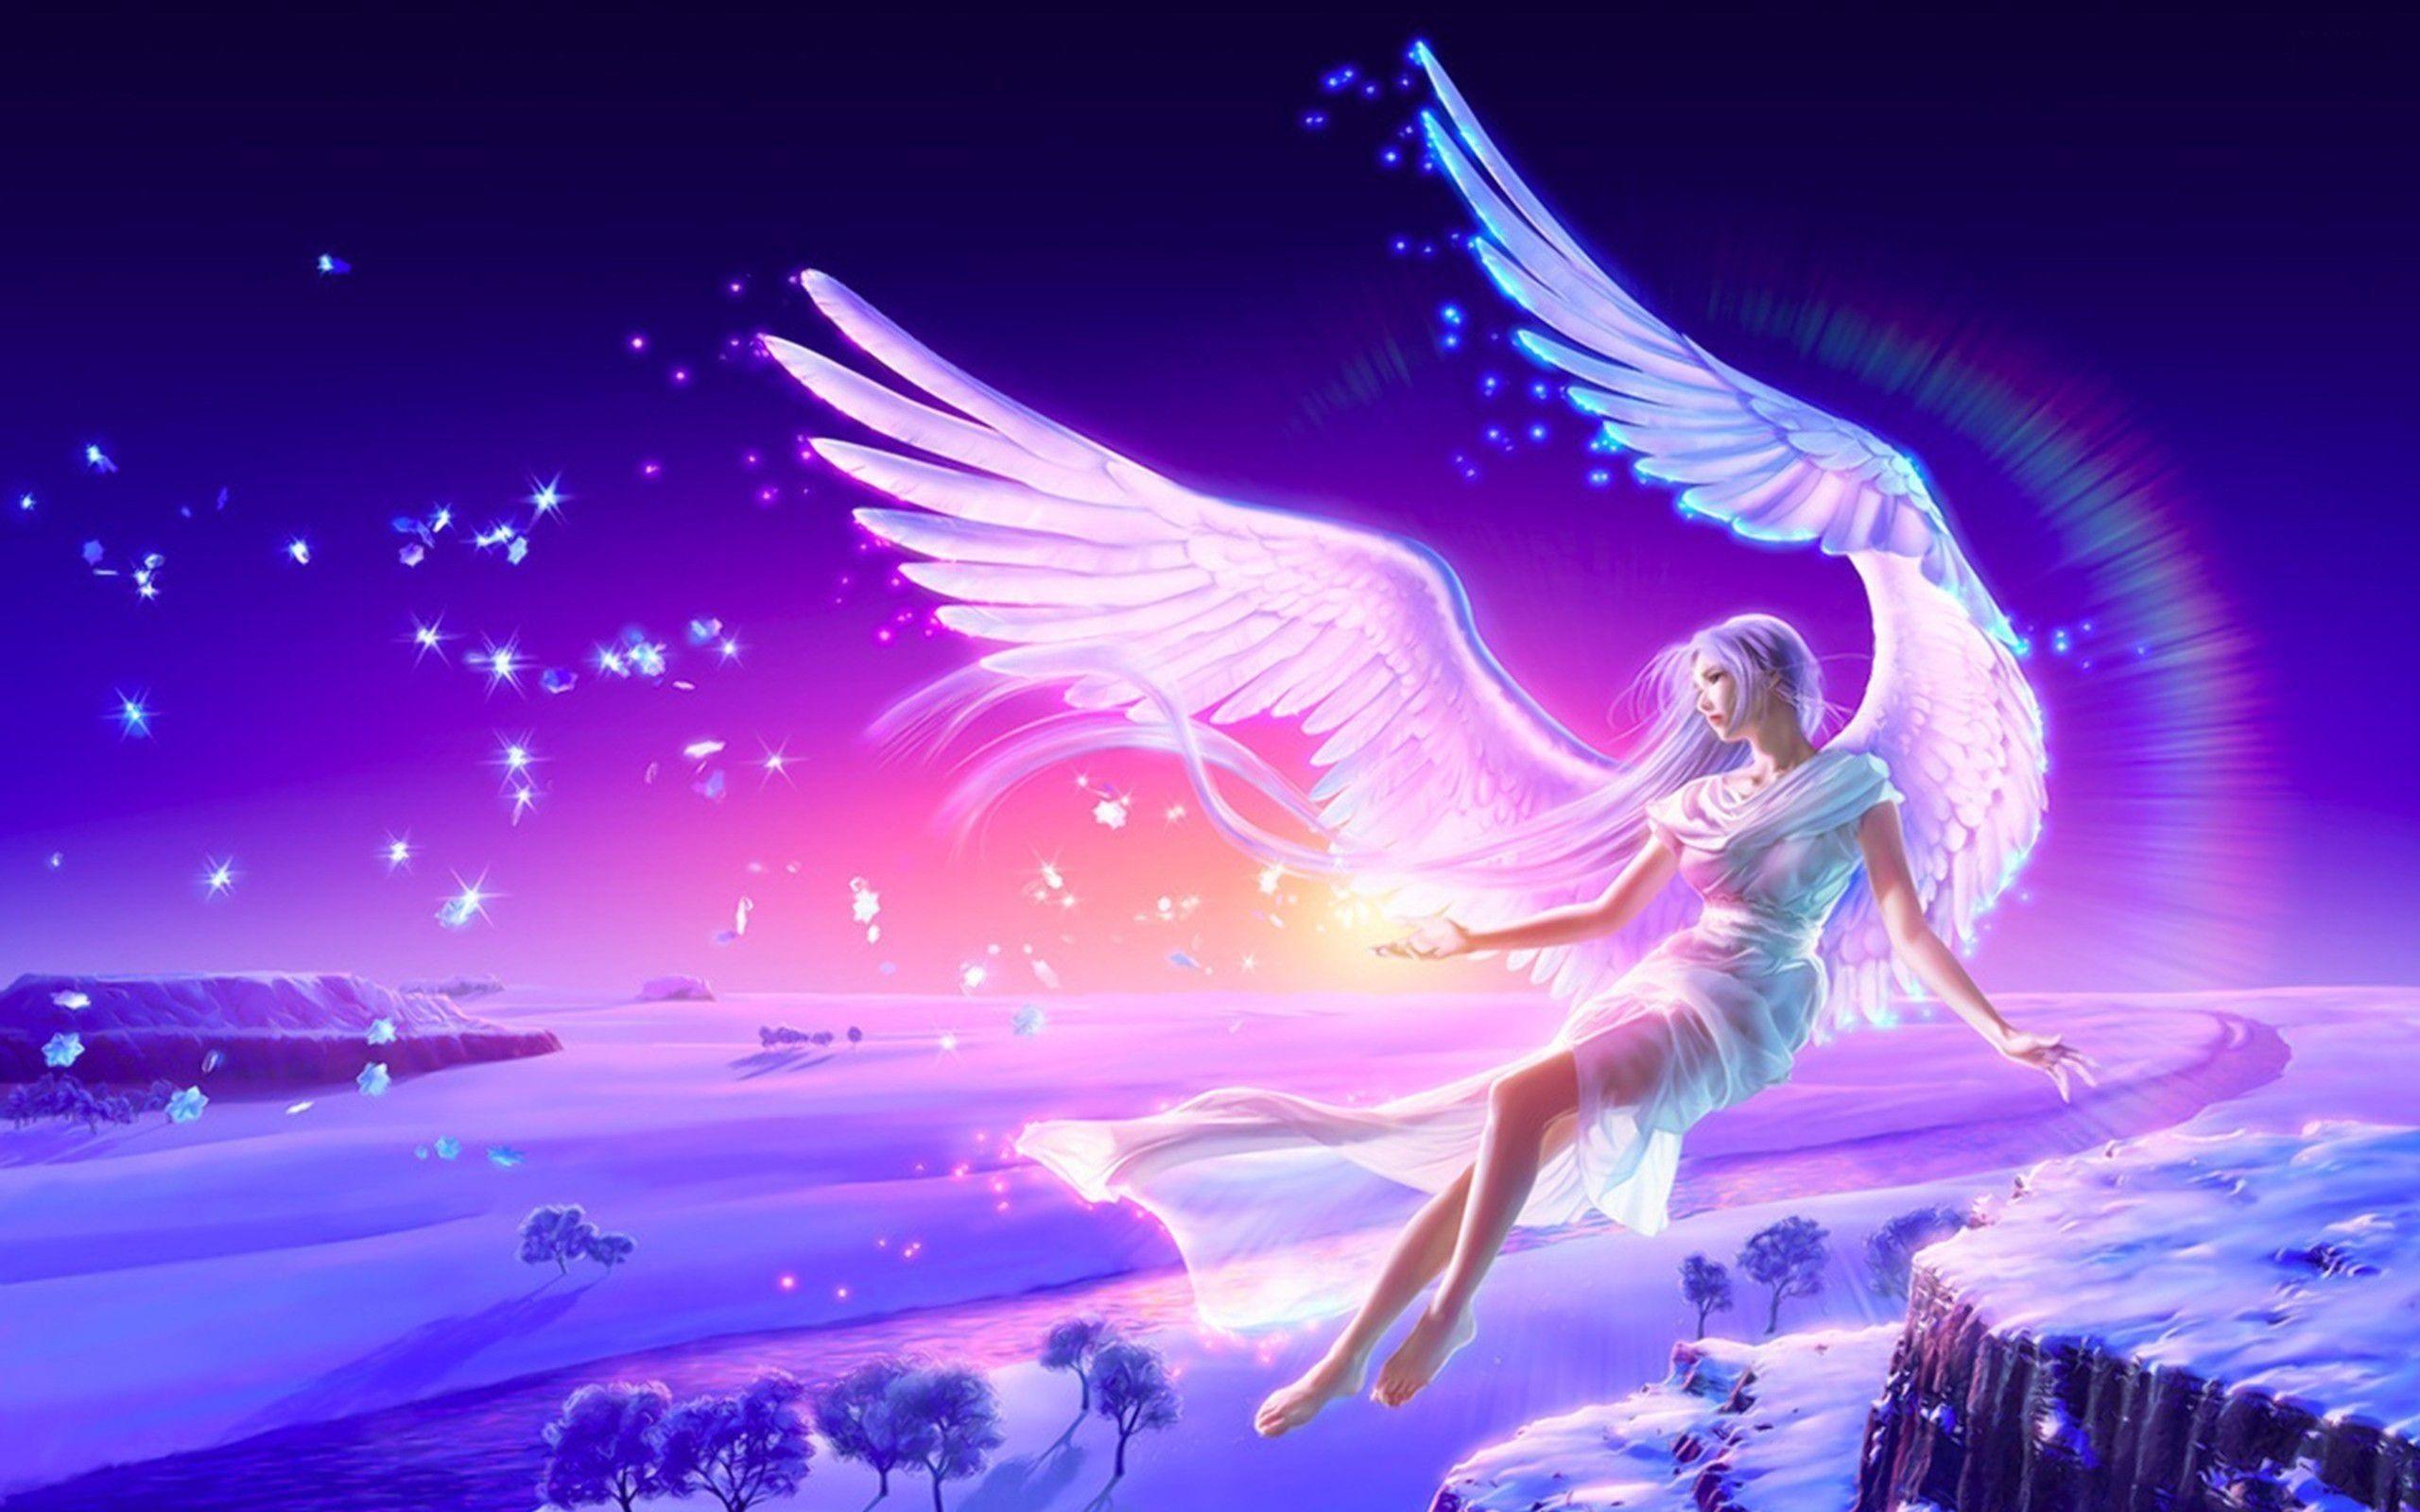 Anime girl a beautiful guardian angel anime and cartoon - Beautiful anime wallpaper hd ...